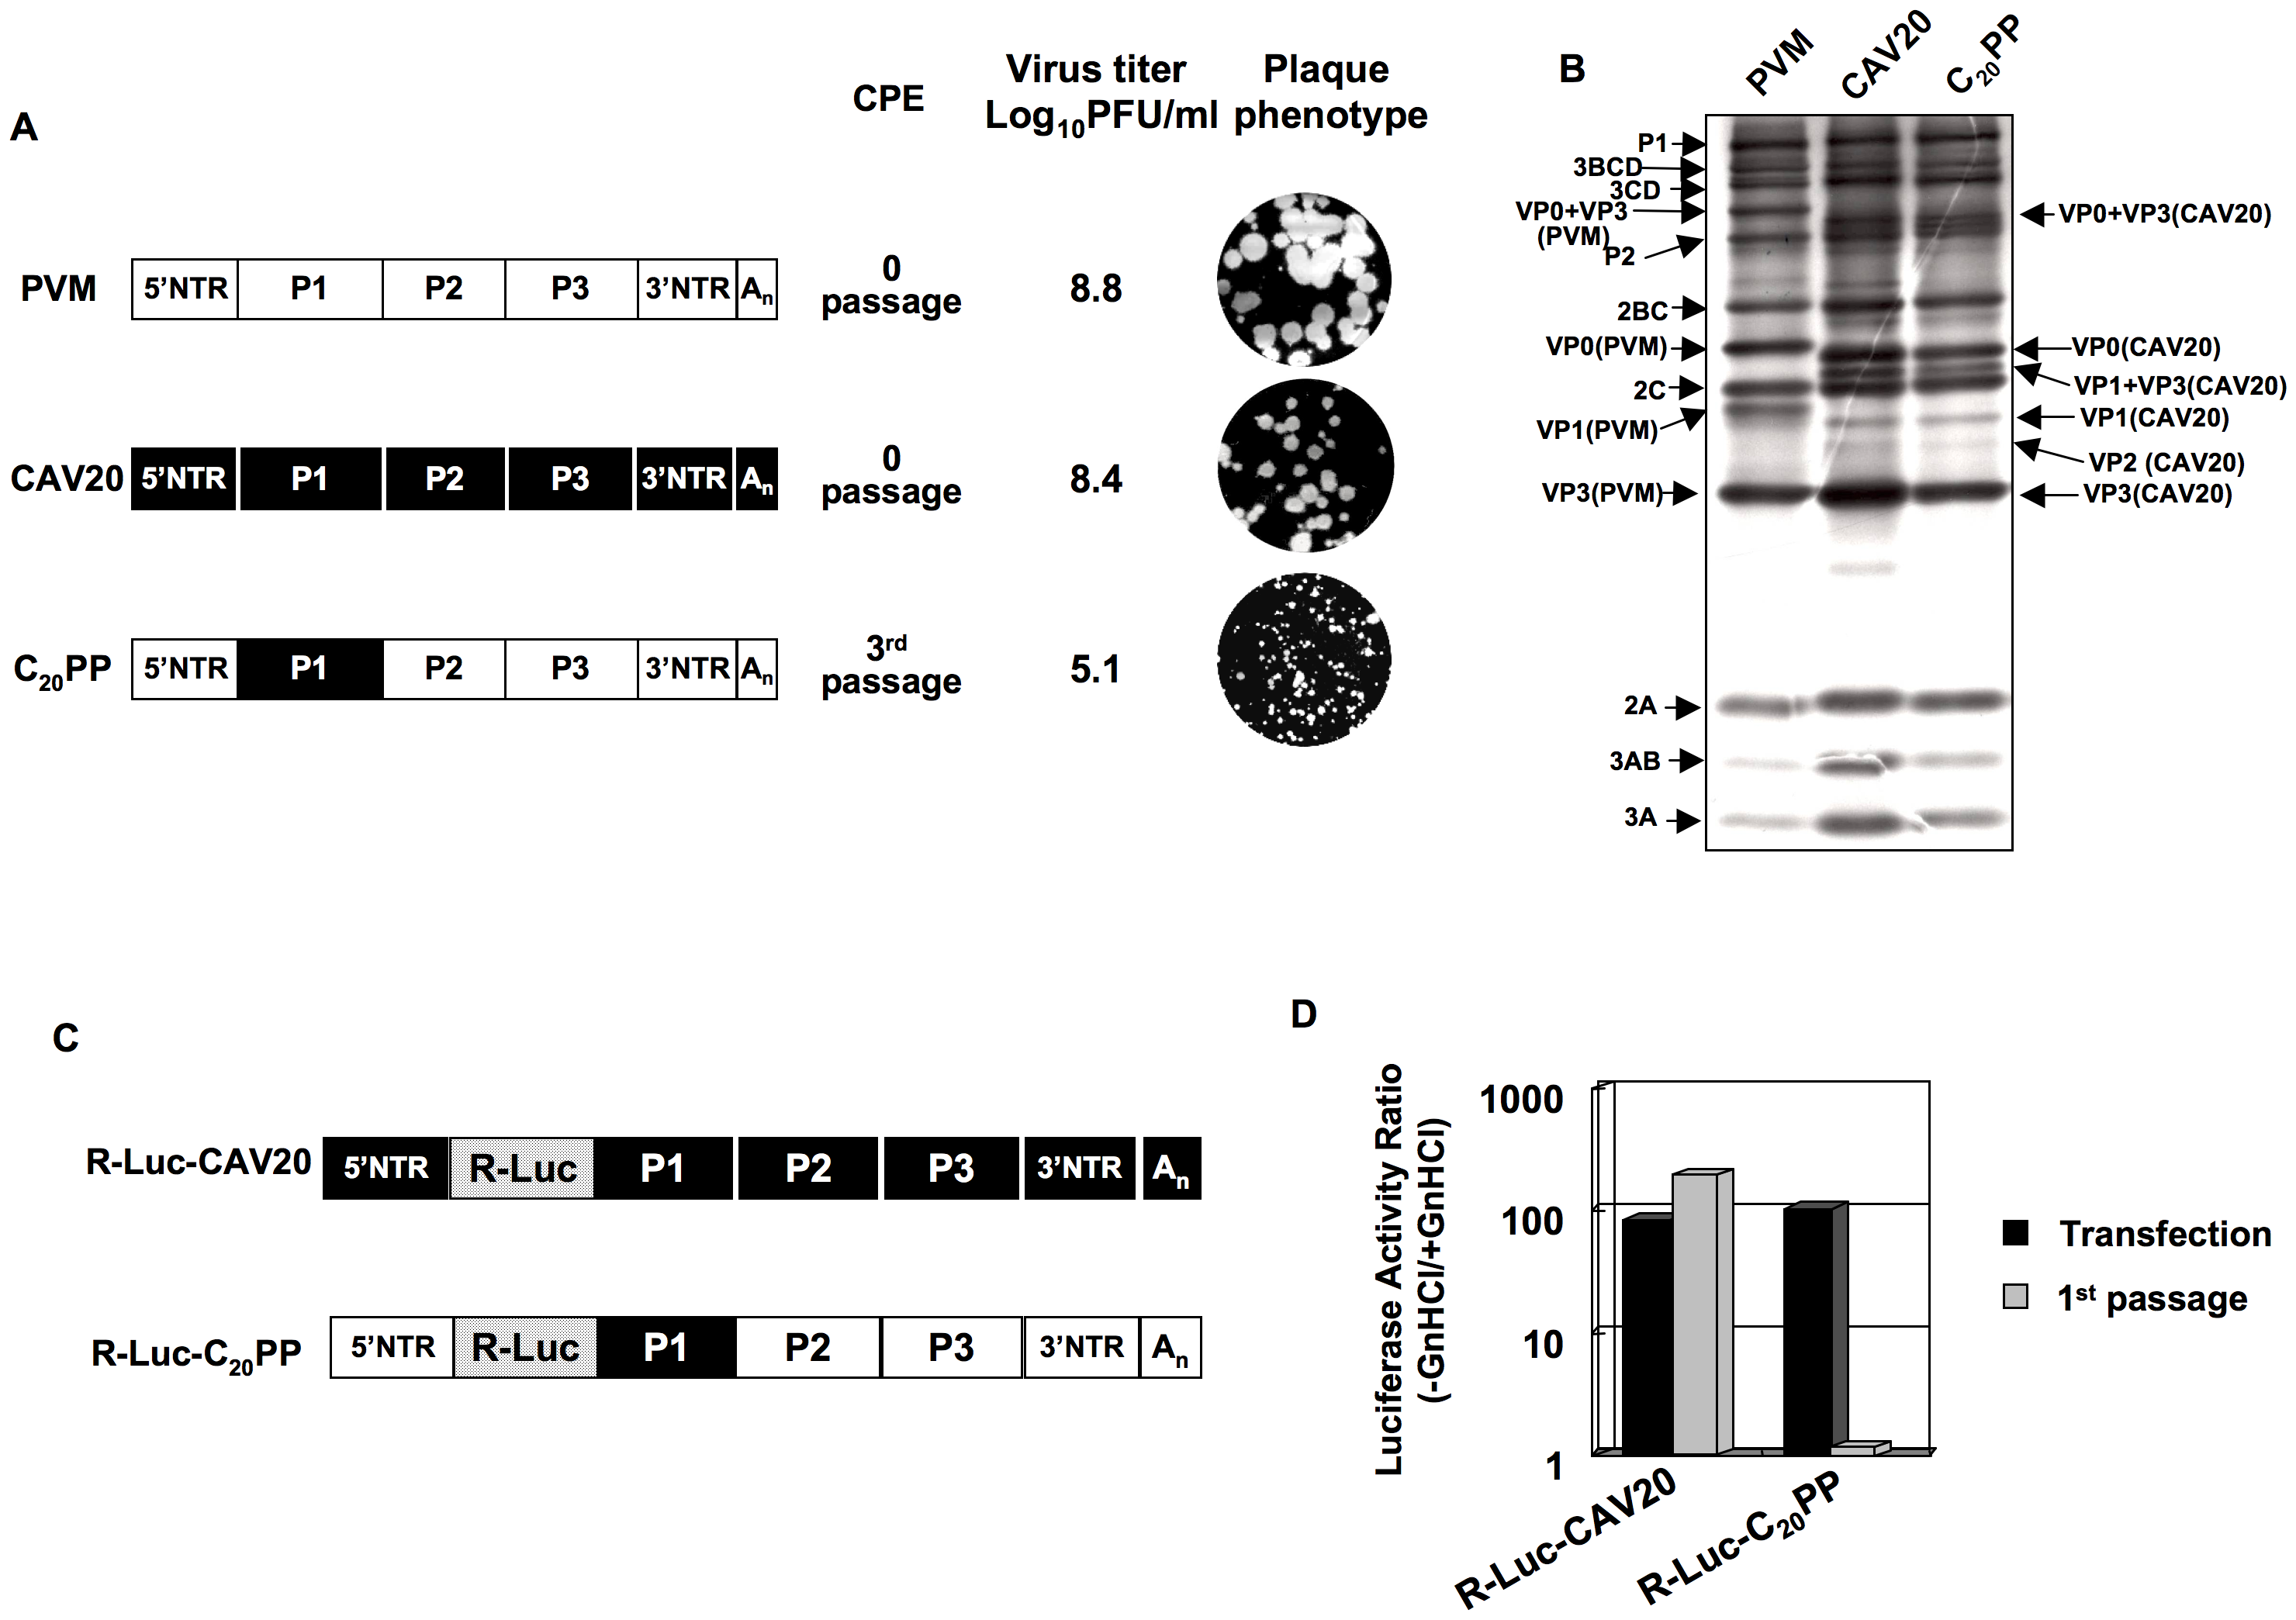 Chimeric virus C<sub>20</sub>PP containing the capsid-coding region of CAV20 is defective in encapsidation.